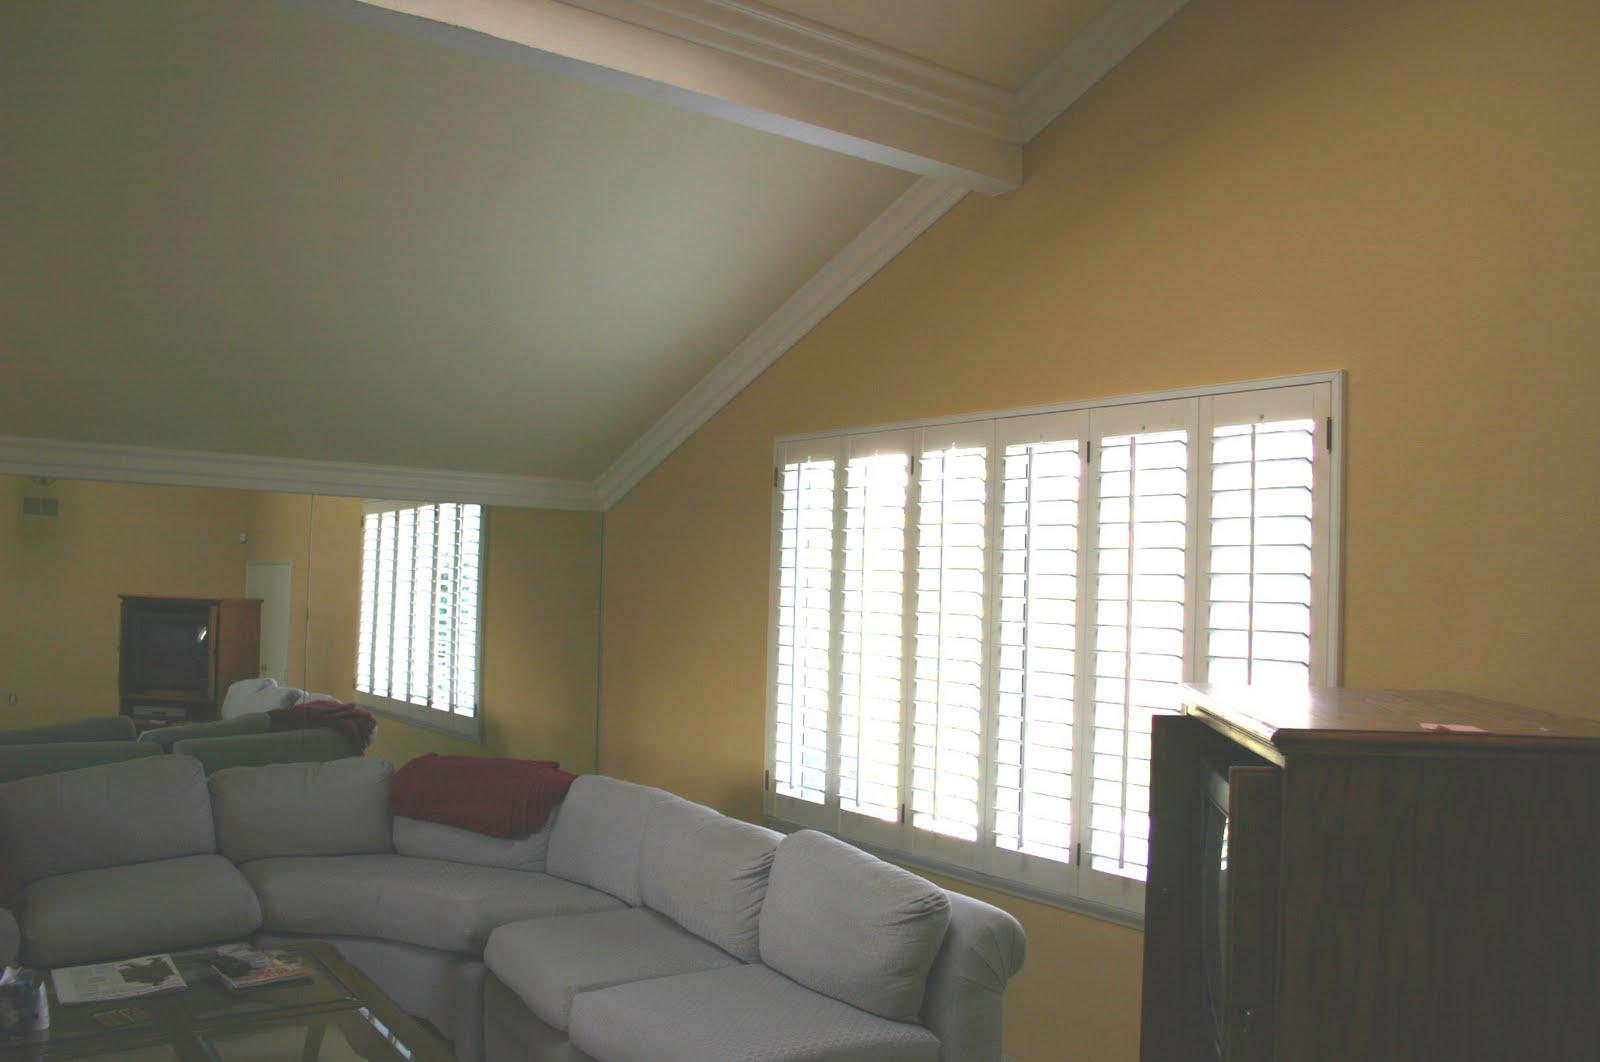 Living room progress dunn edwards crossroads walls and cream